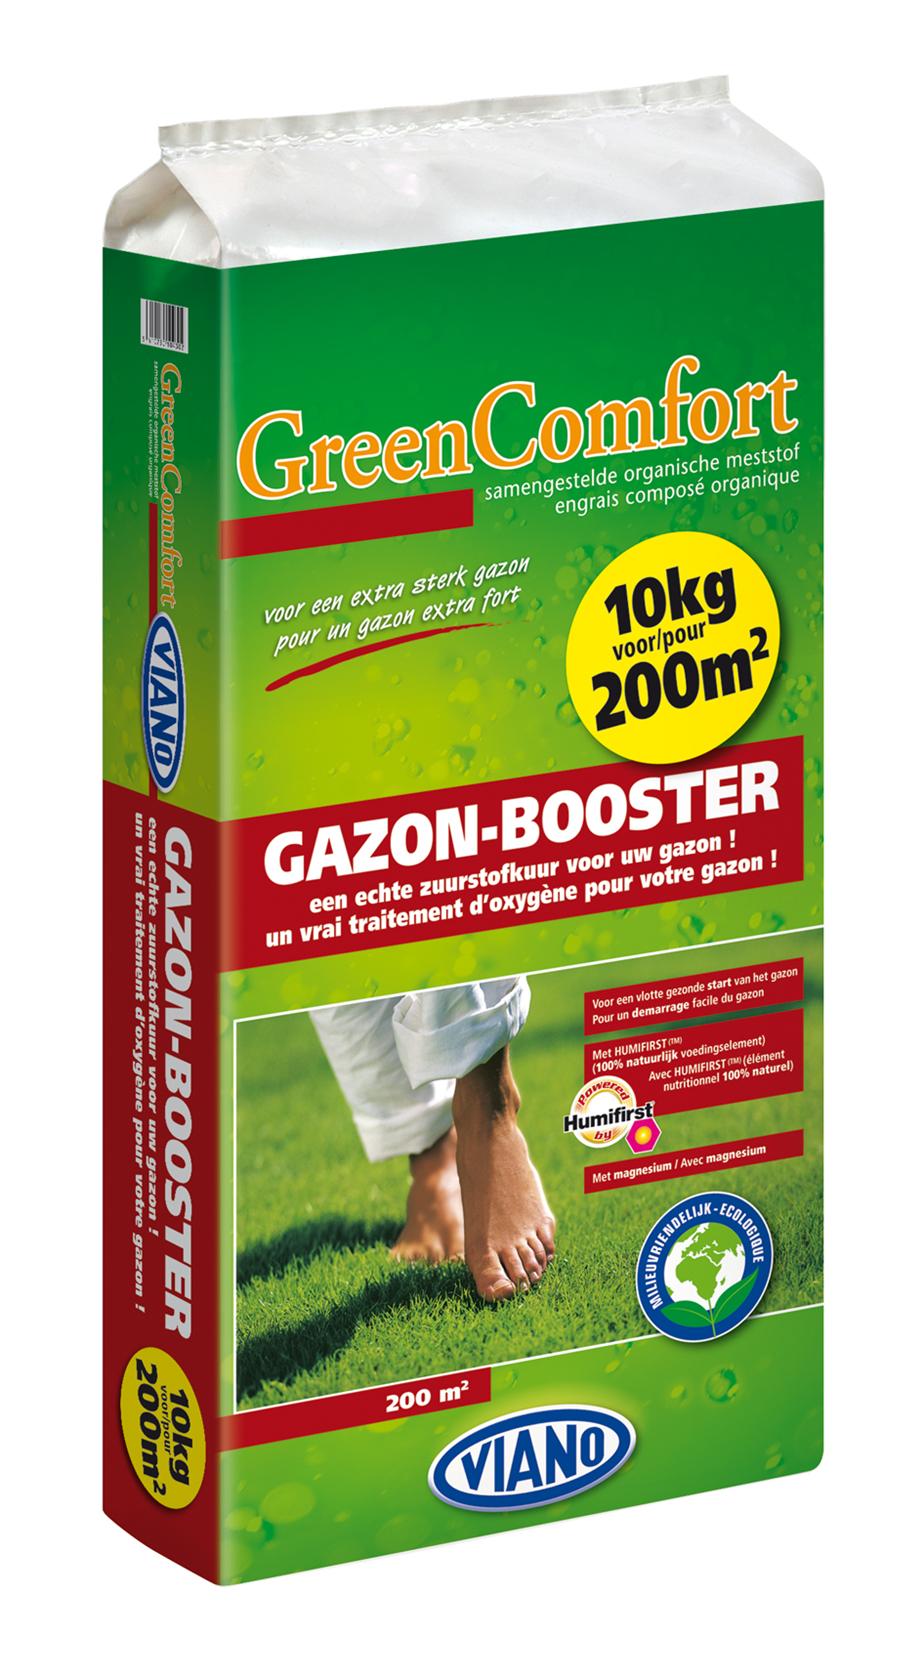 Gazon-Booster-zak-10-kg-NPK-12-3-3-3MgO-humifirst